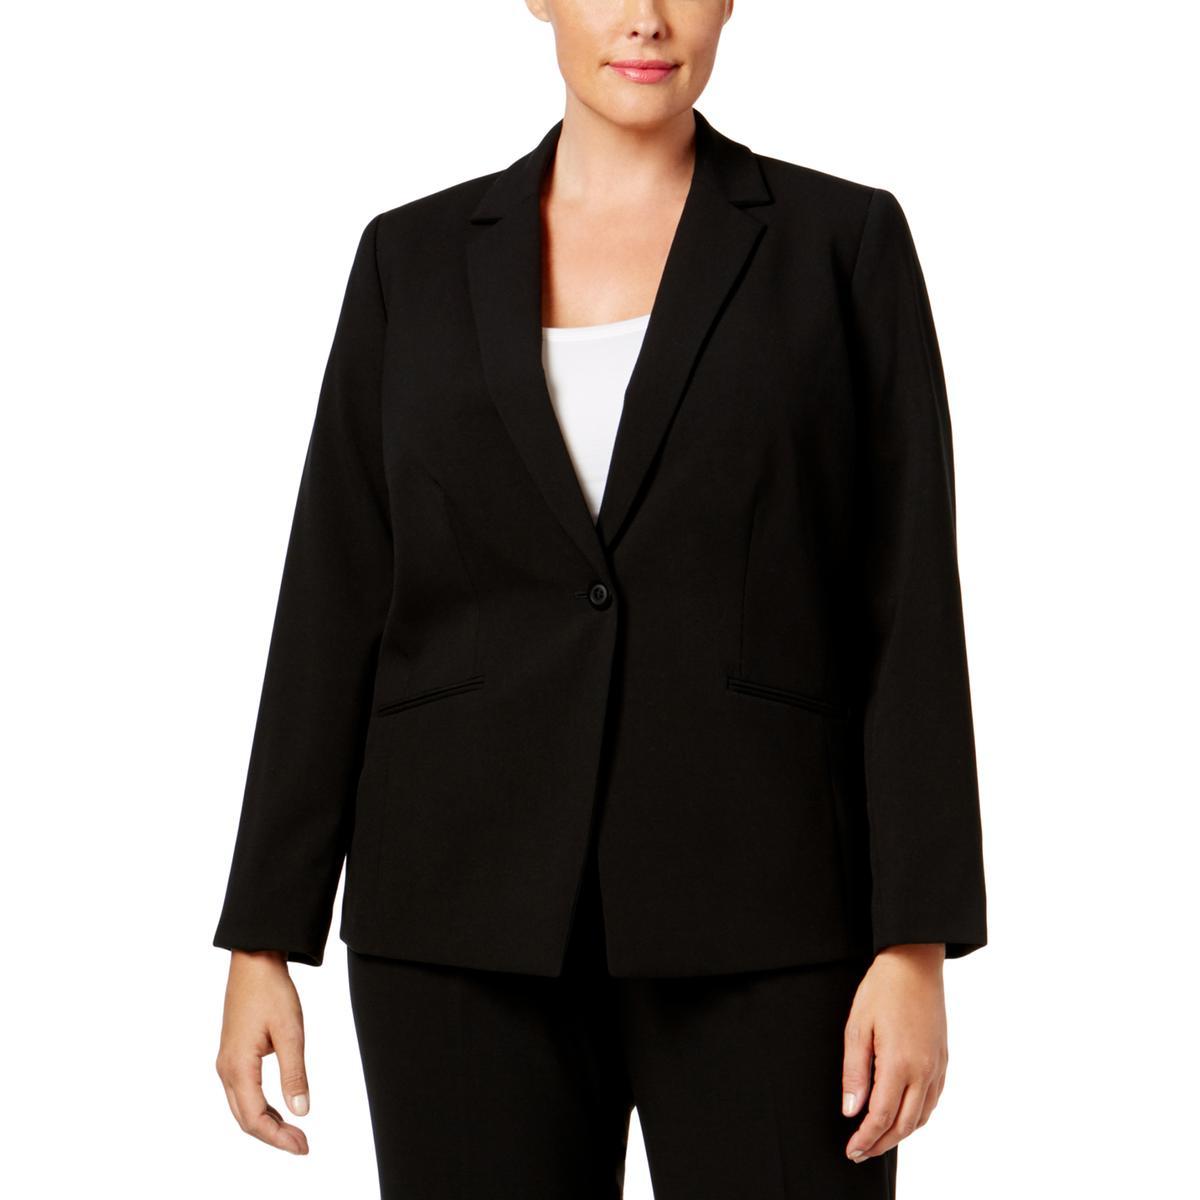 015a8a24f17 Details about Tahari ASL Womens Bracelet Sleeve One-Button Blazer Jacket  Plus BHFO 9471